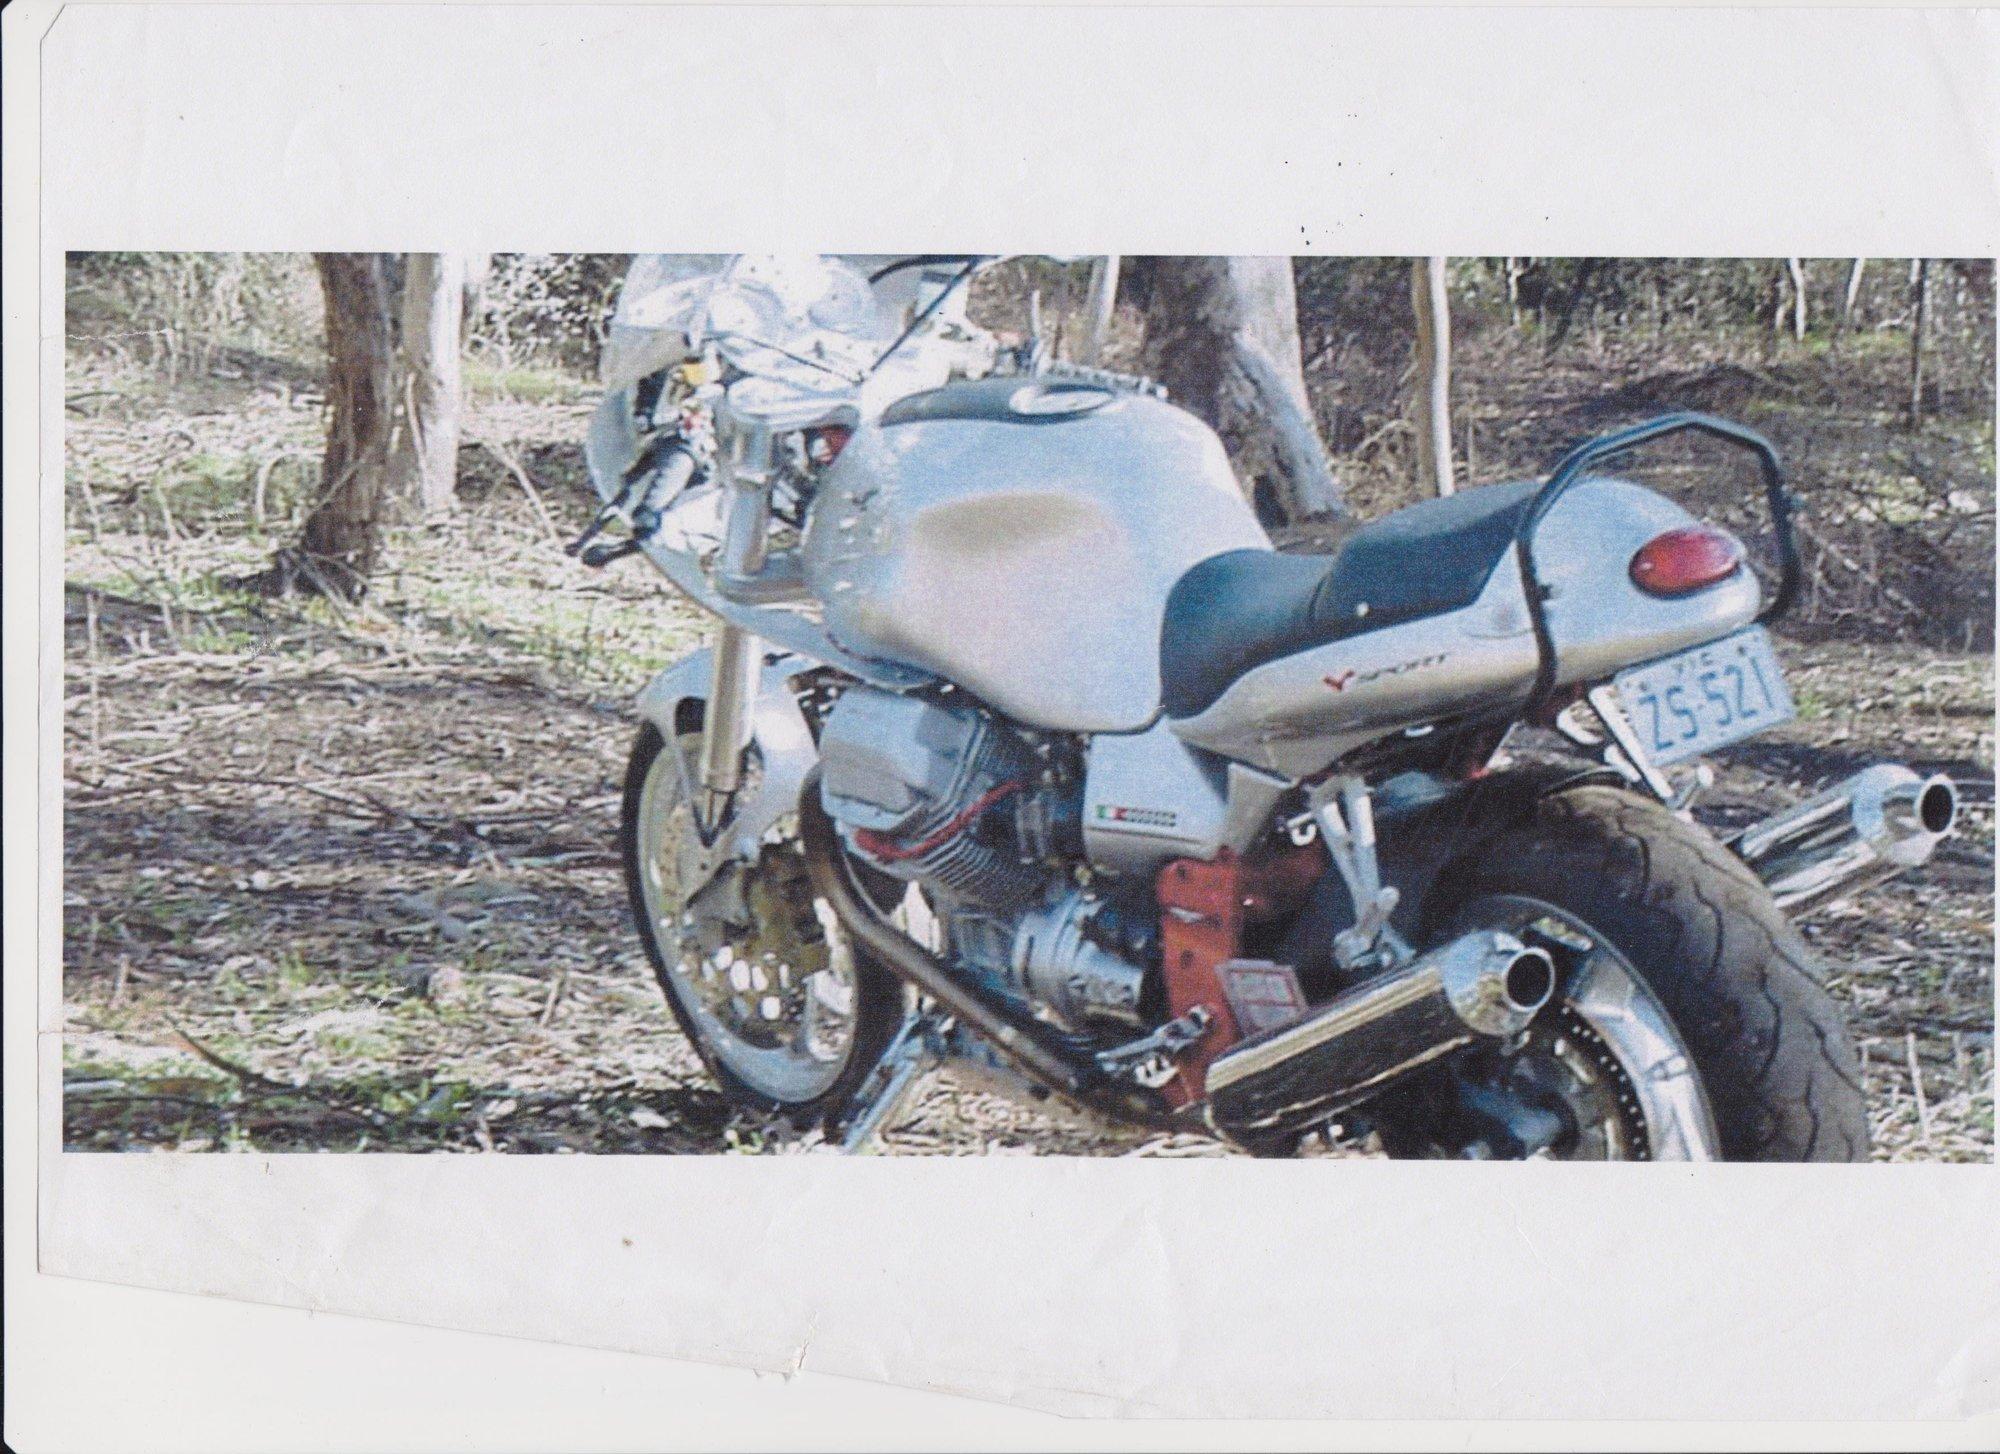 Moto Guzzi last shot 001.jpg